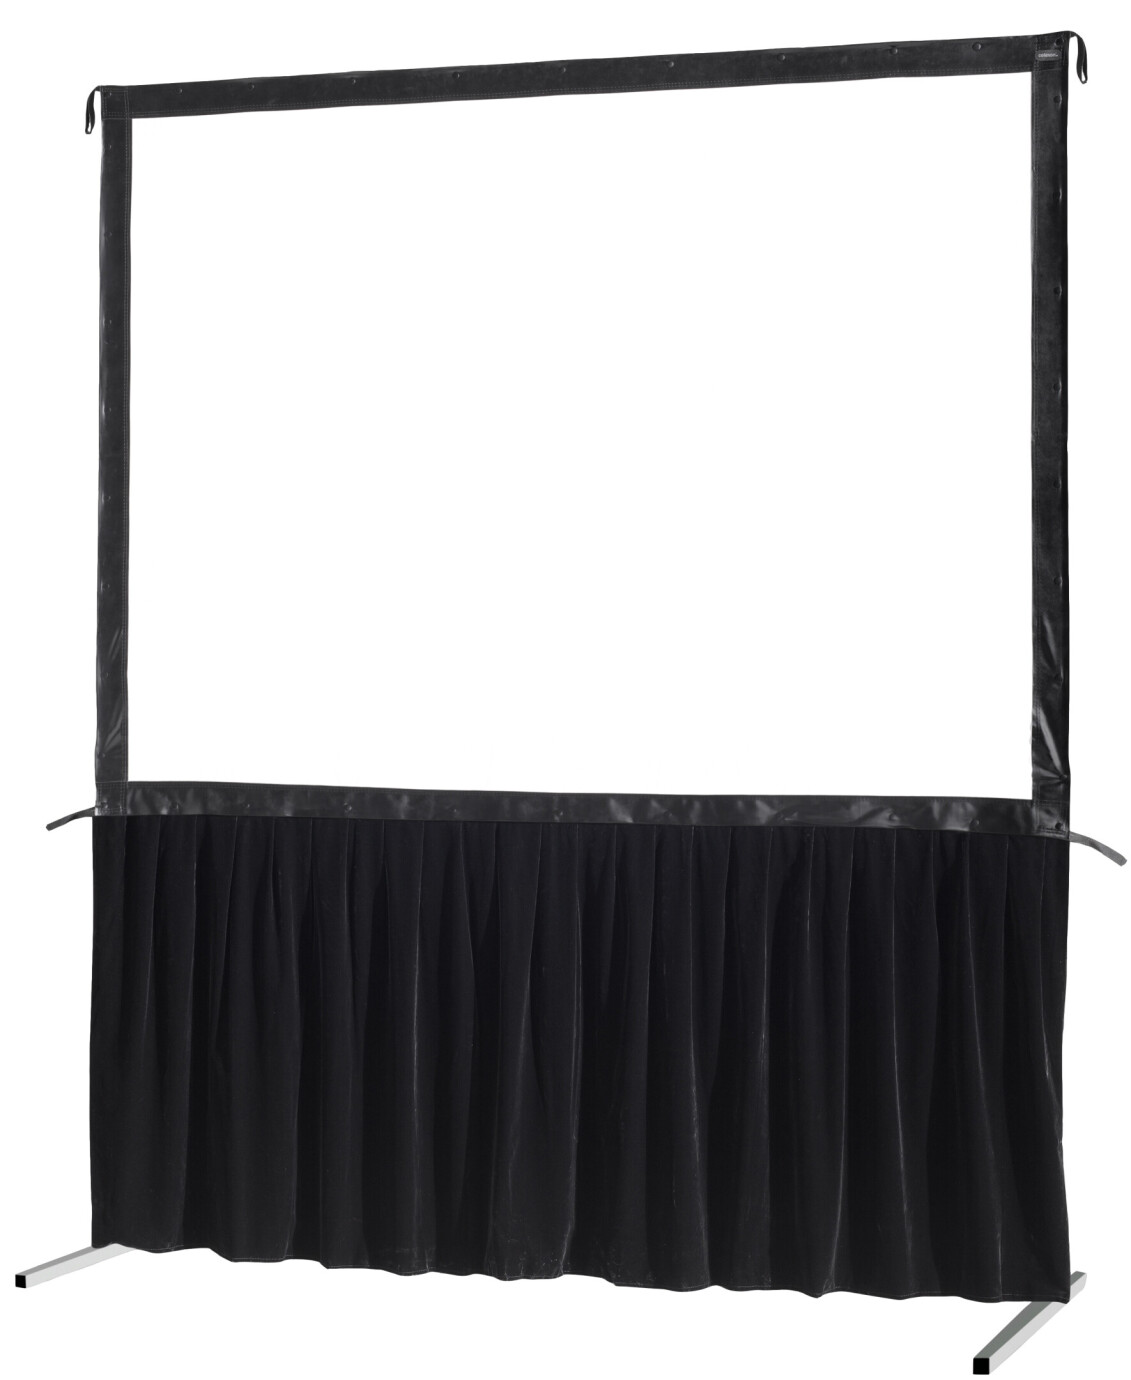 celexon Vorhangset 1-seitig für Faltrahmenleinwand Mobil Expert 305 x 229 cm